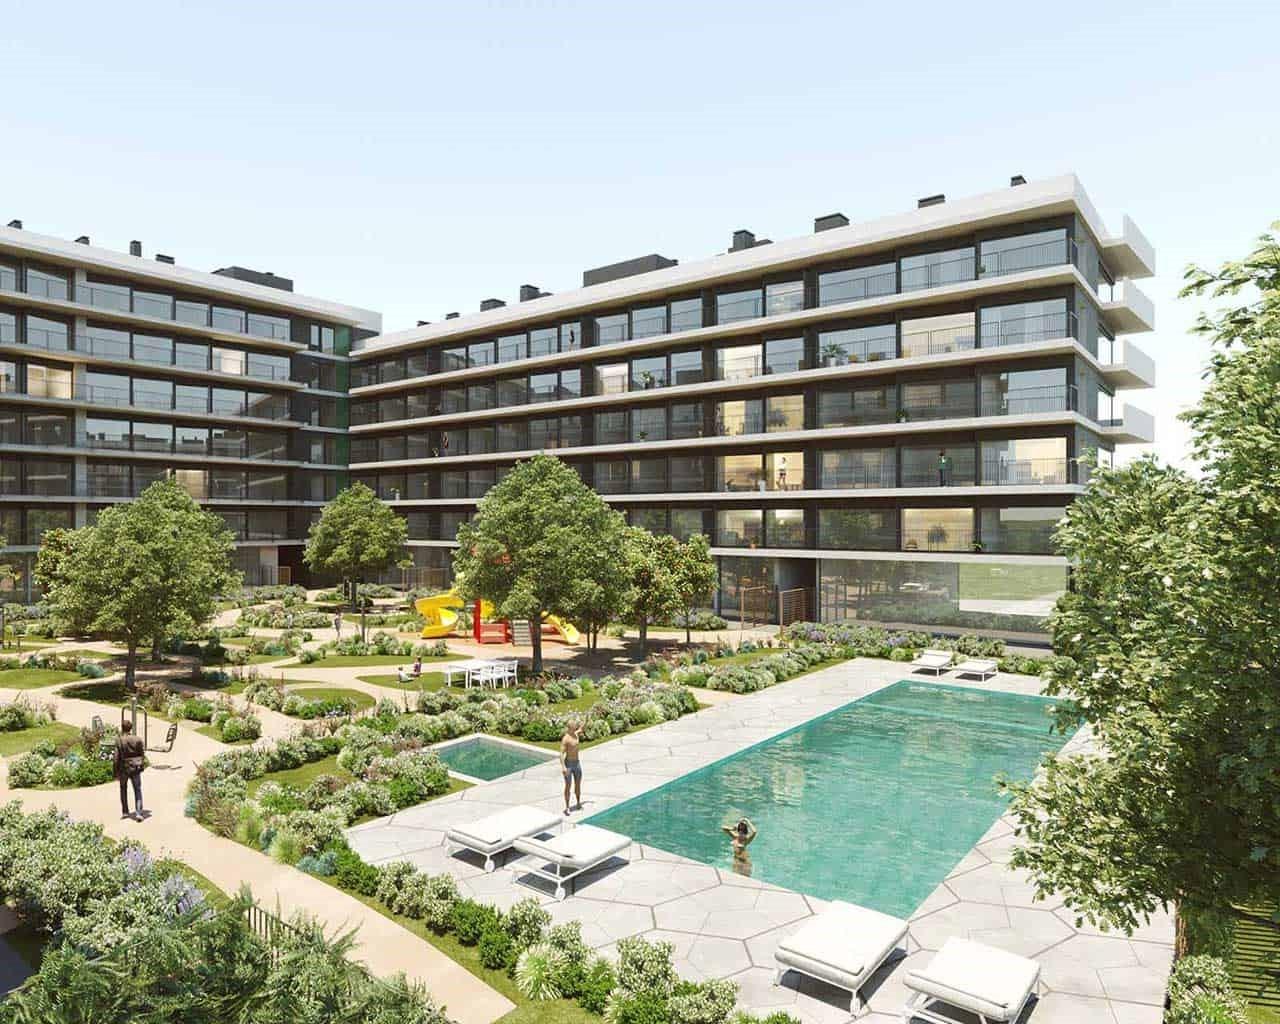 Lux Garden-jardim piscina